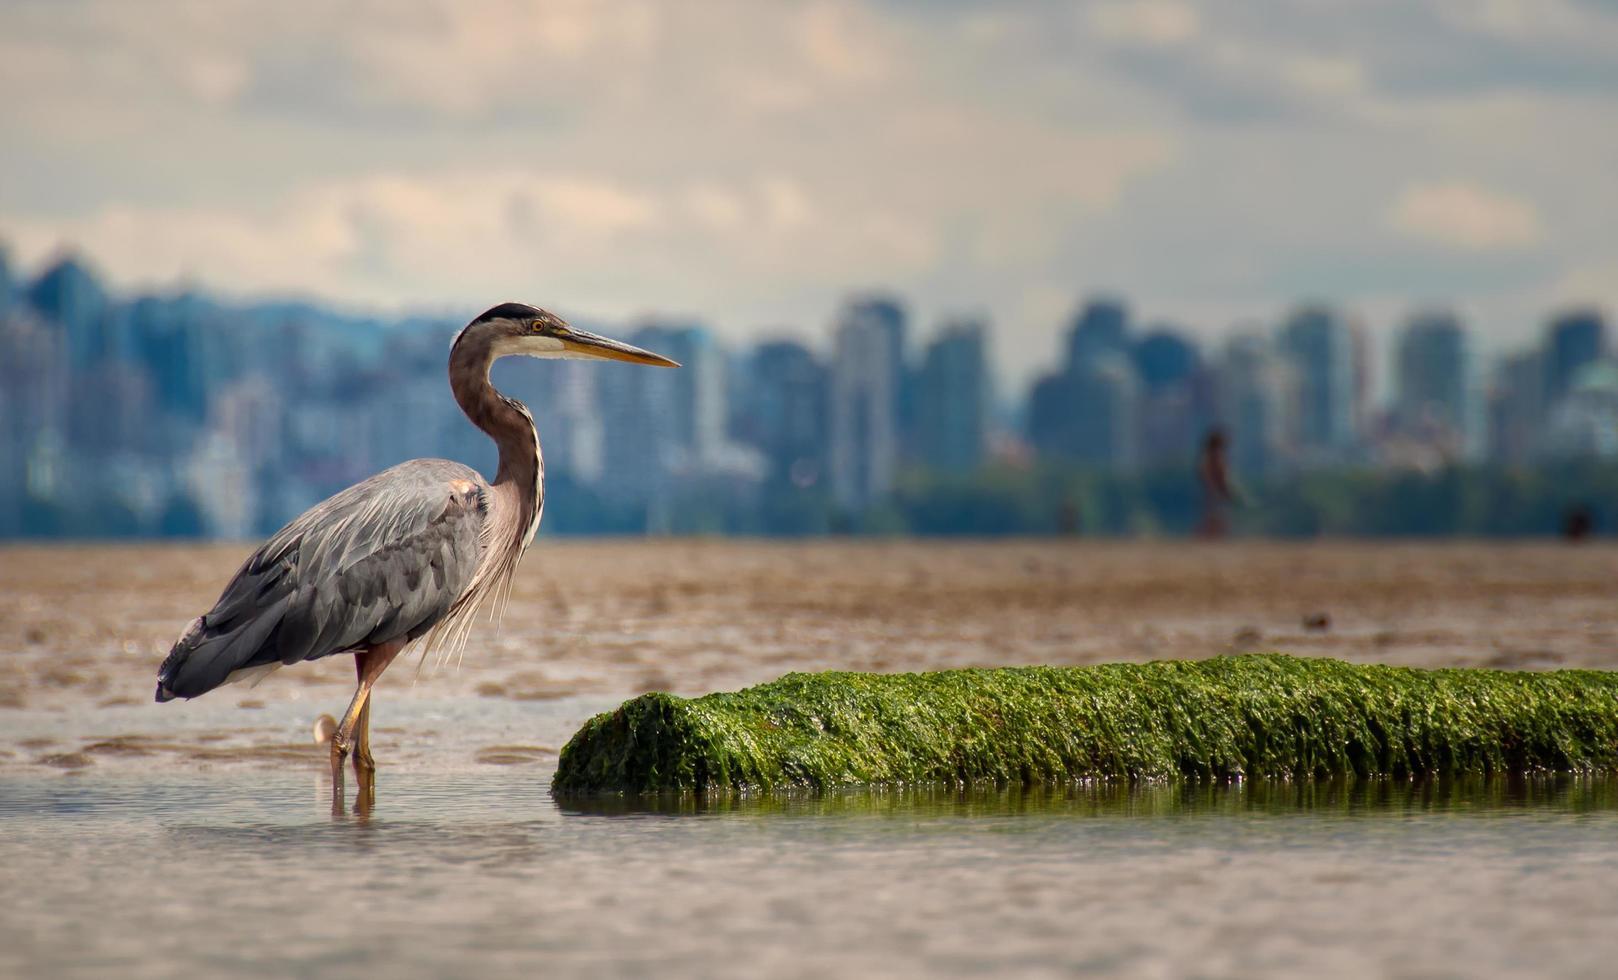 Great blue heron standing in water photo